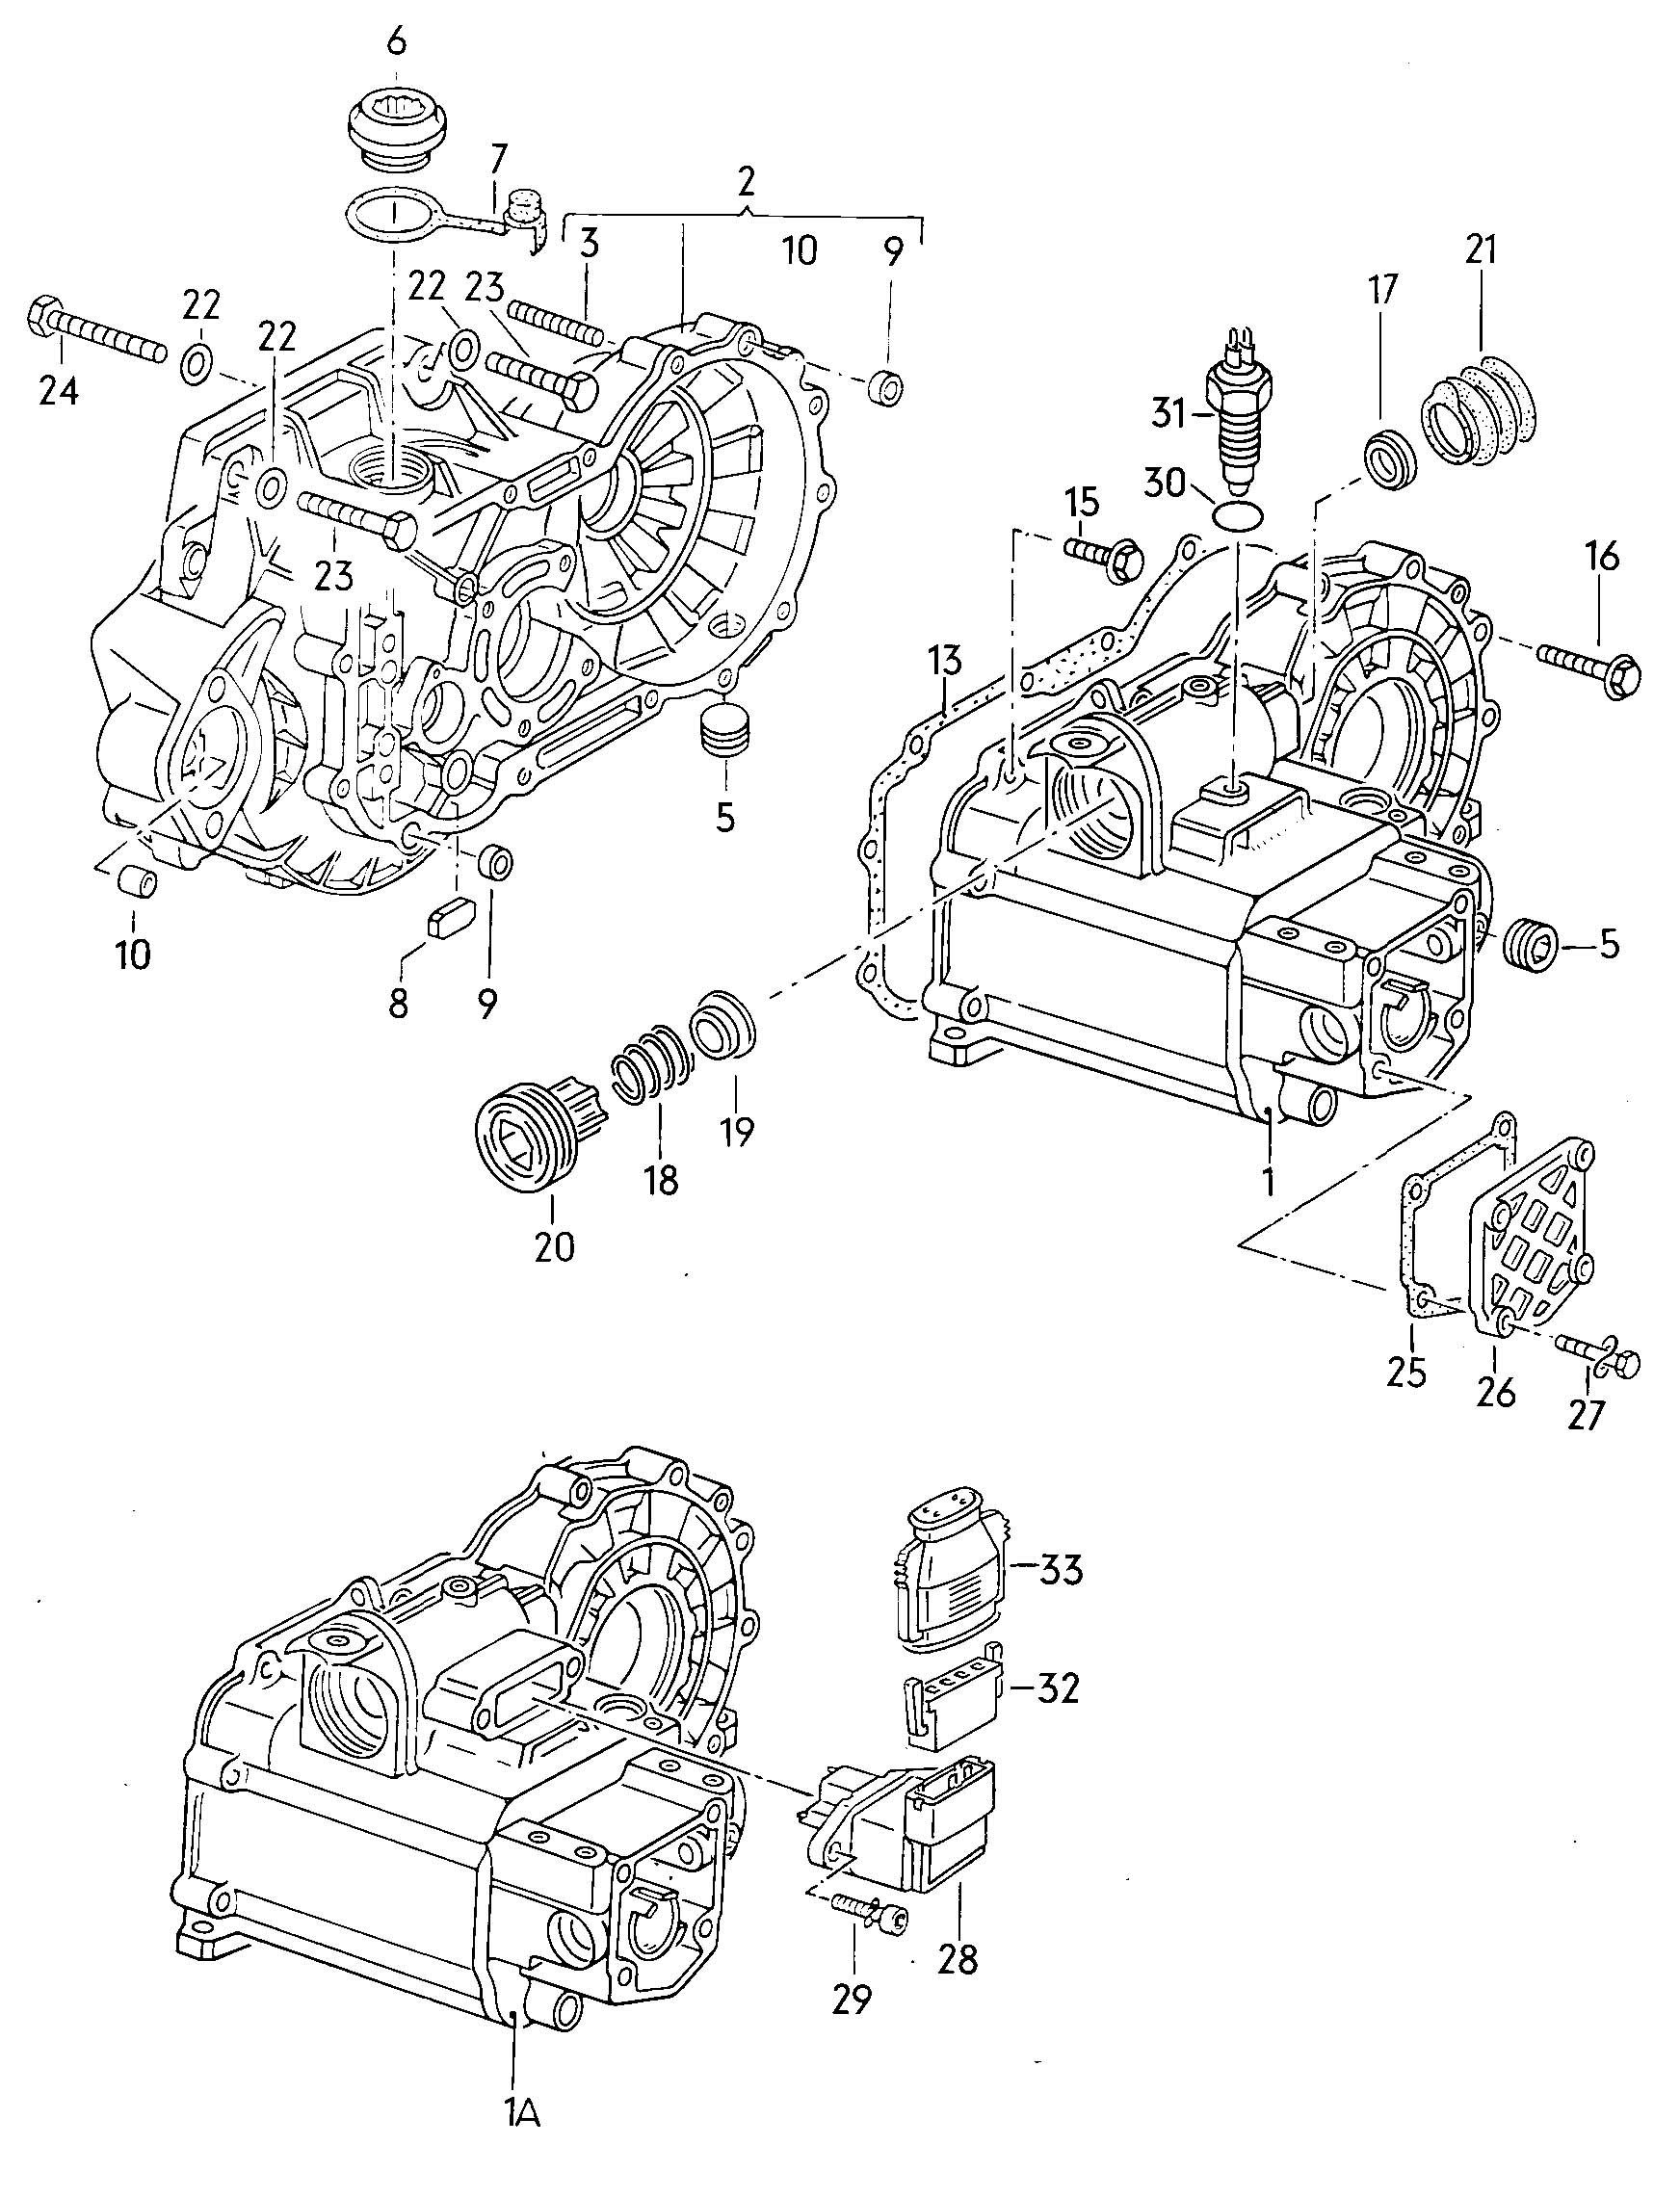 Volkswagen Jetta Plug 5 Speed Manual Transmission Also Use   Manualtransmissio  Drain Plug